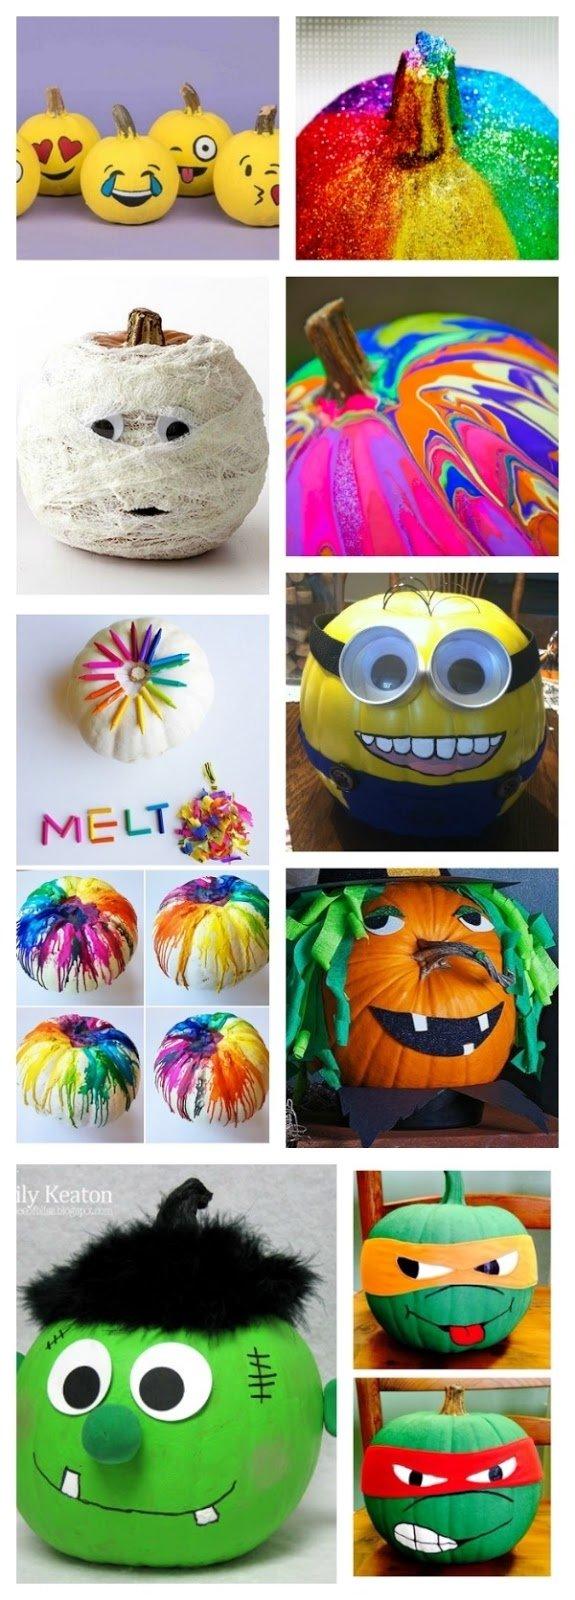 10 Stunning No Carve Pumpkin Decorating Ideas For Kids no carve pumpkins for kids growing a jeweled rose 3 2020